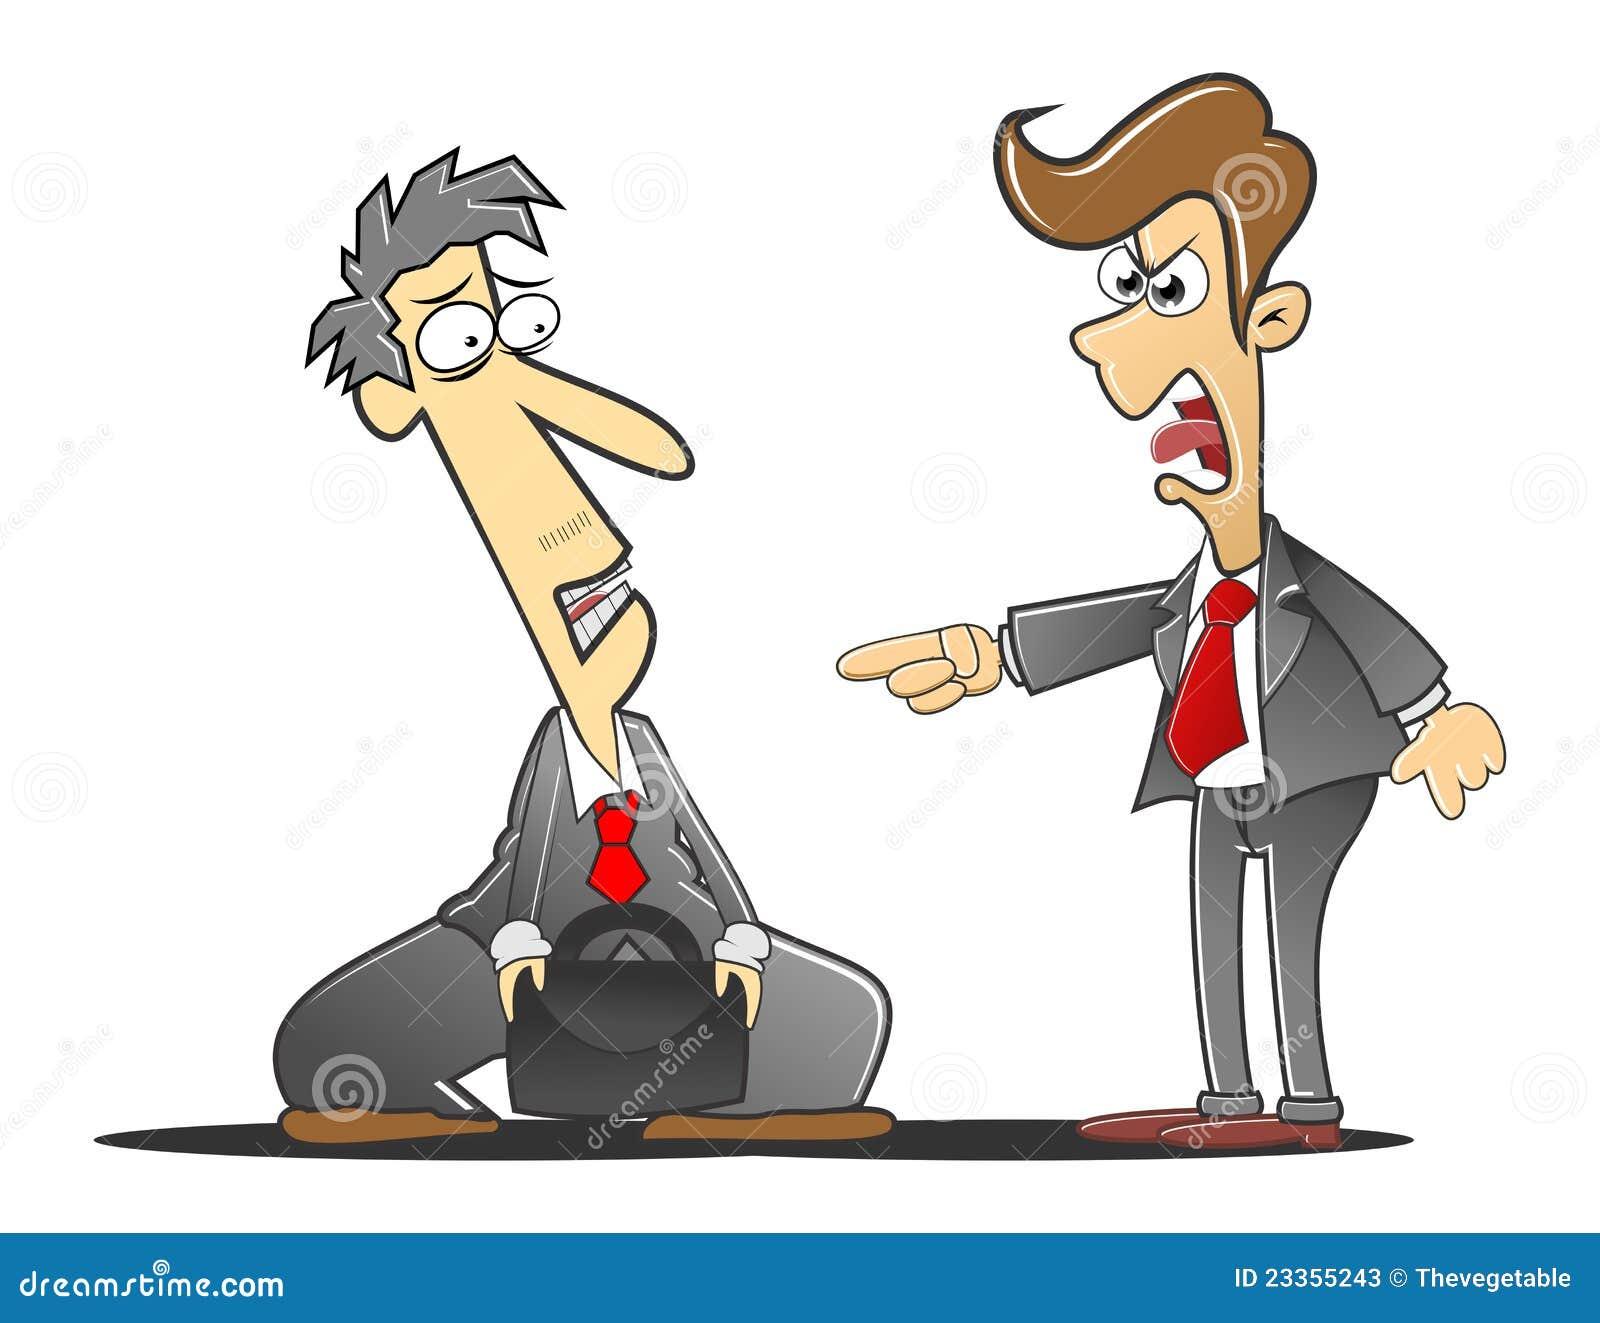 Reprimanded босс